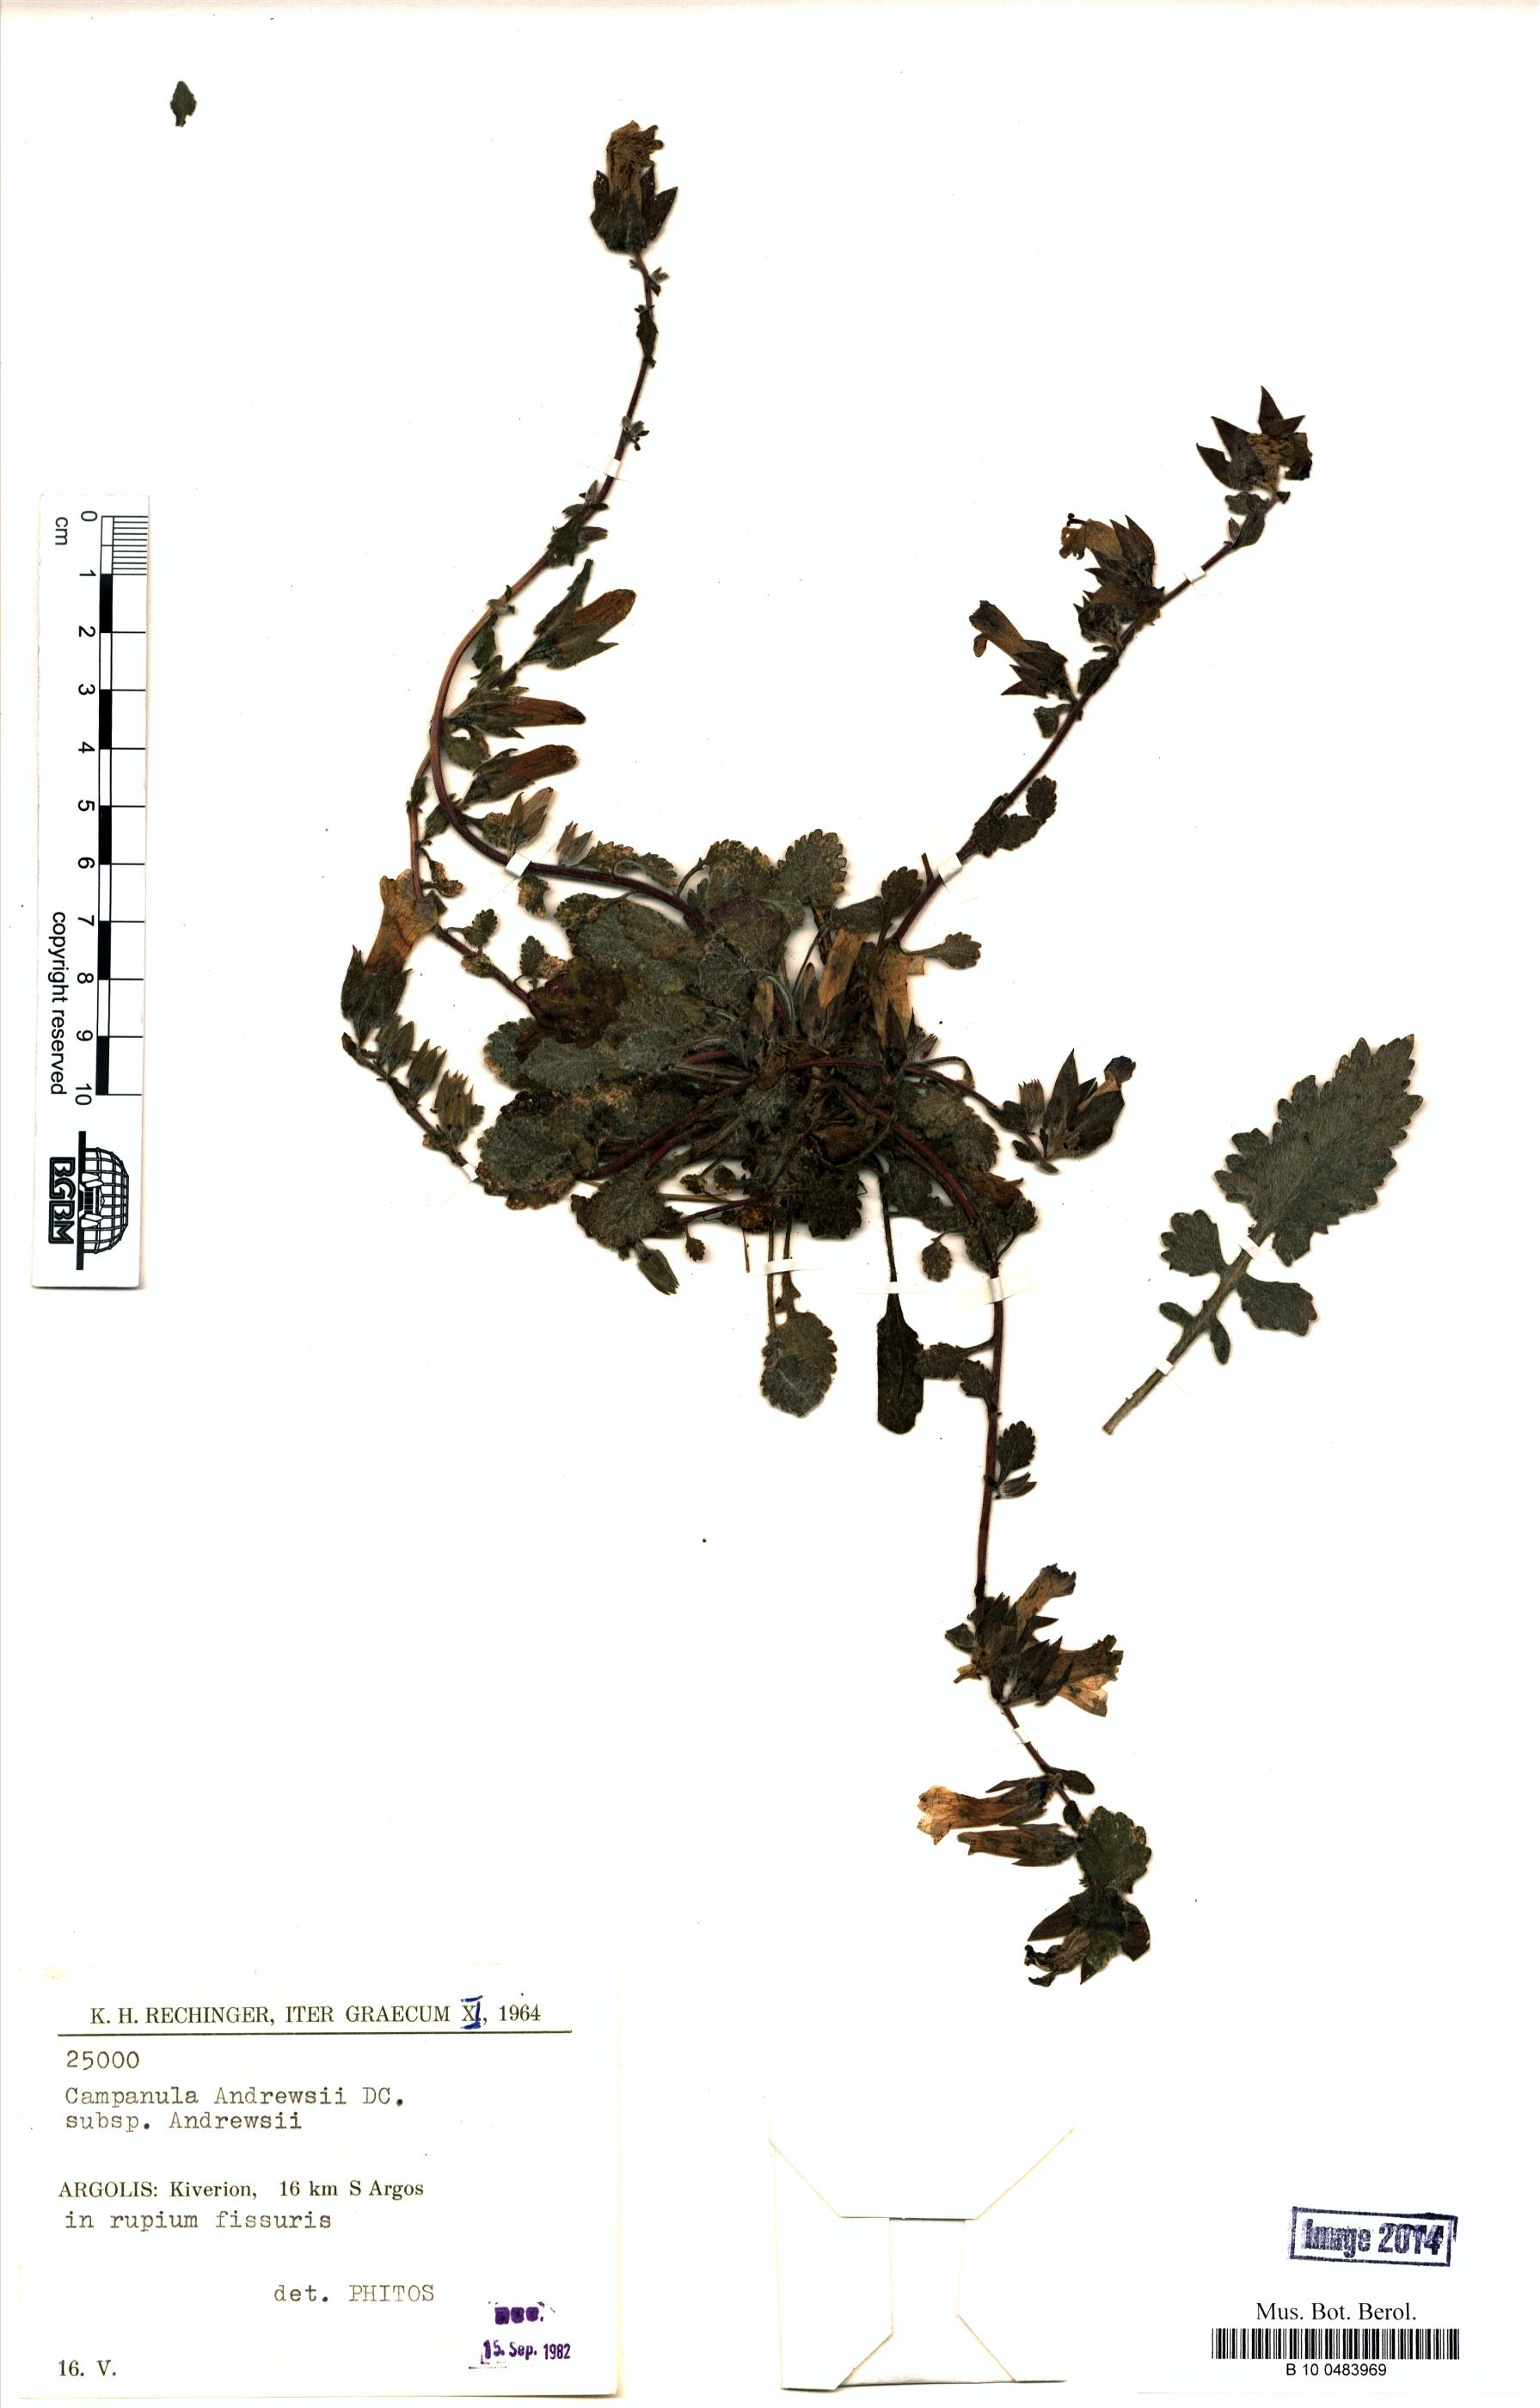 http://ww2.bgbm.org/herbarium/images/B/10/04/83/96/B_10_0483969.jpg